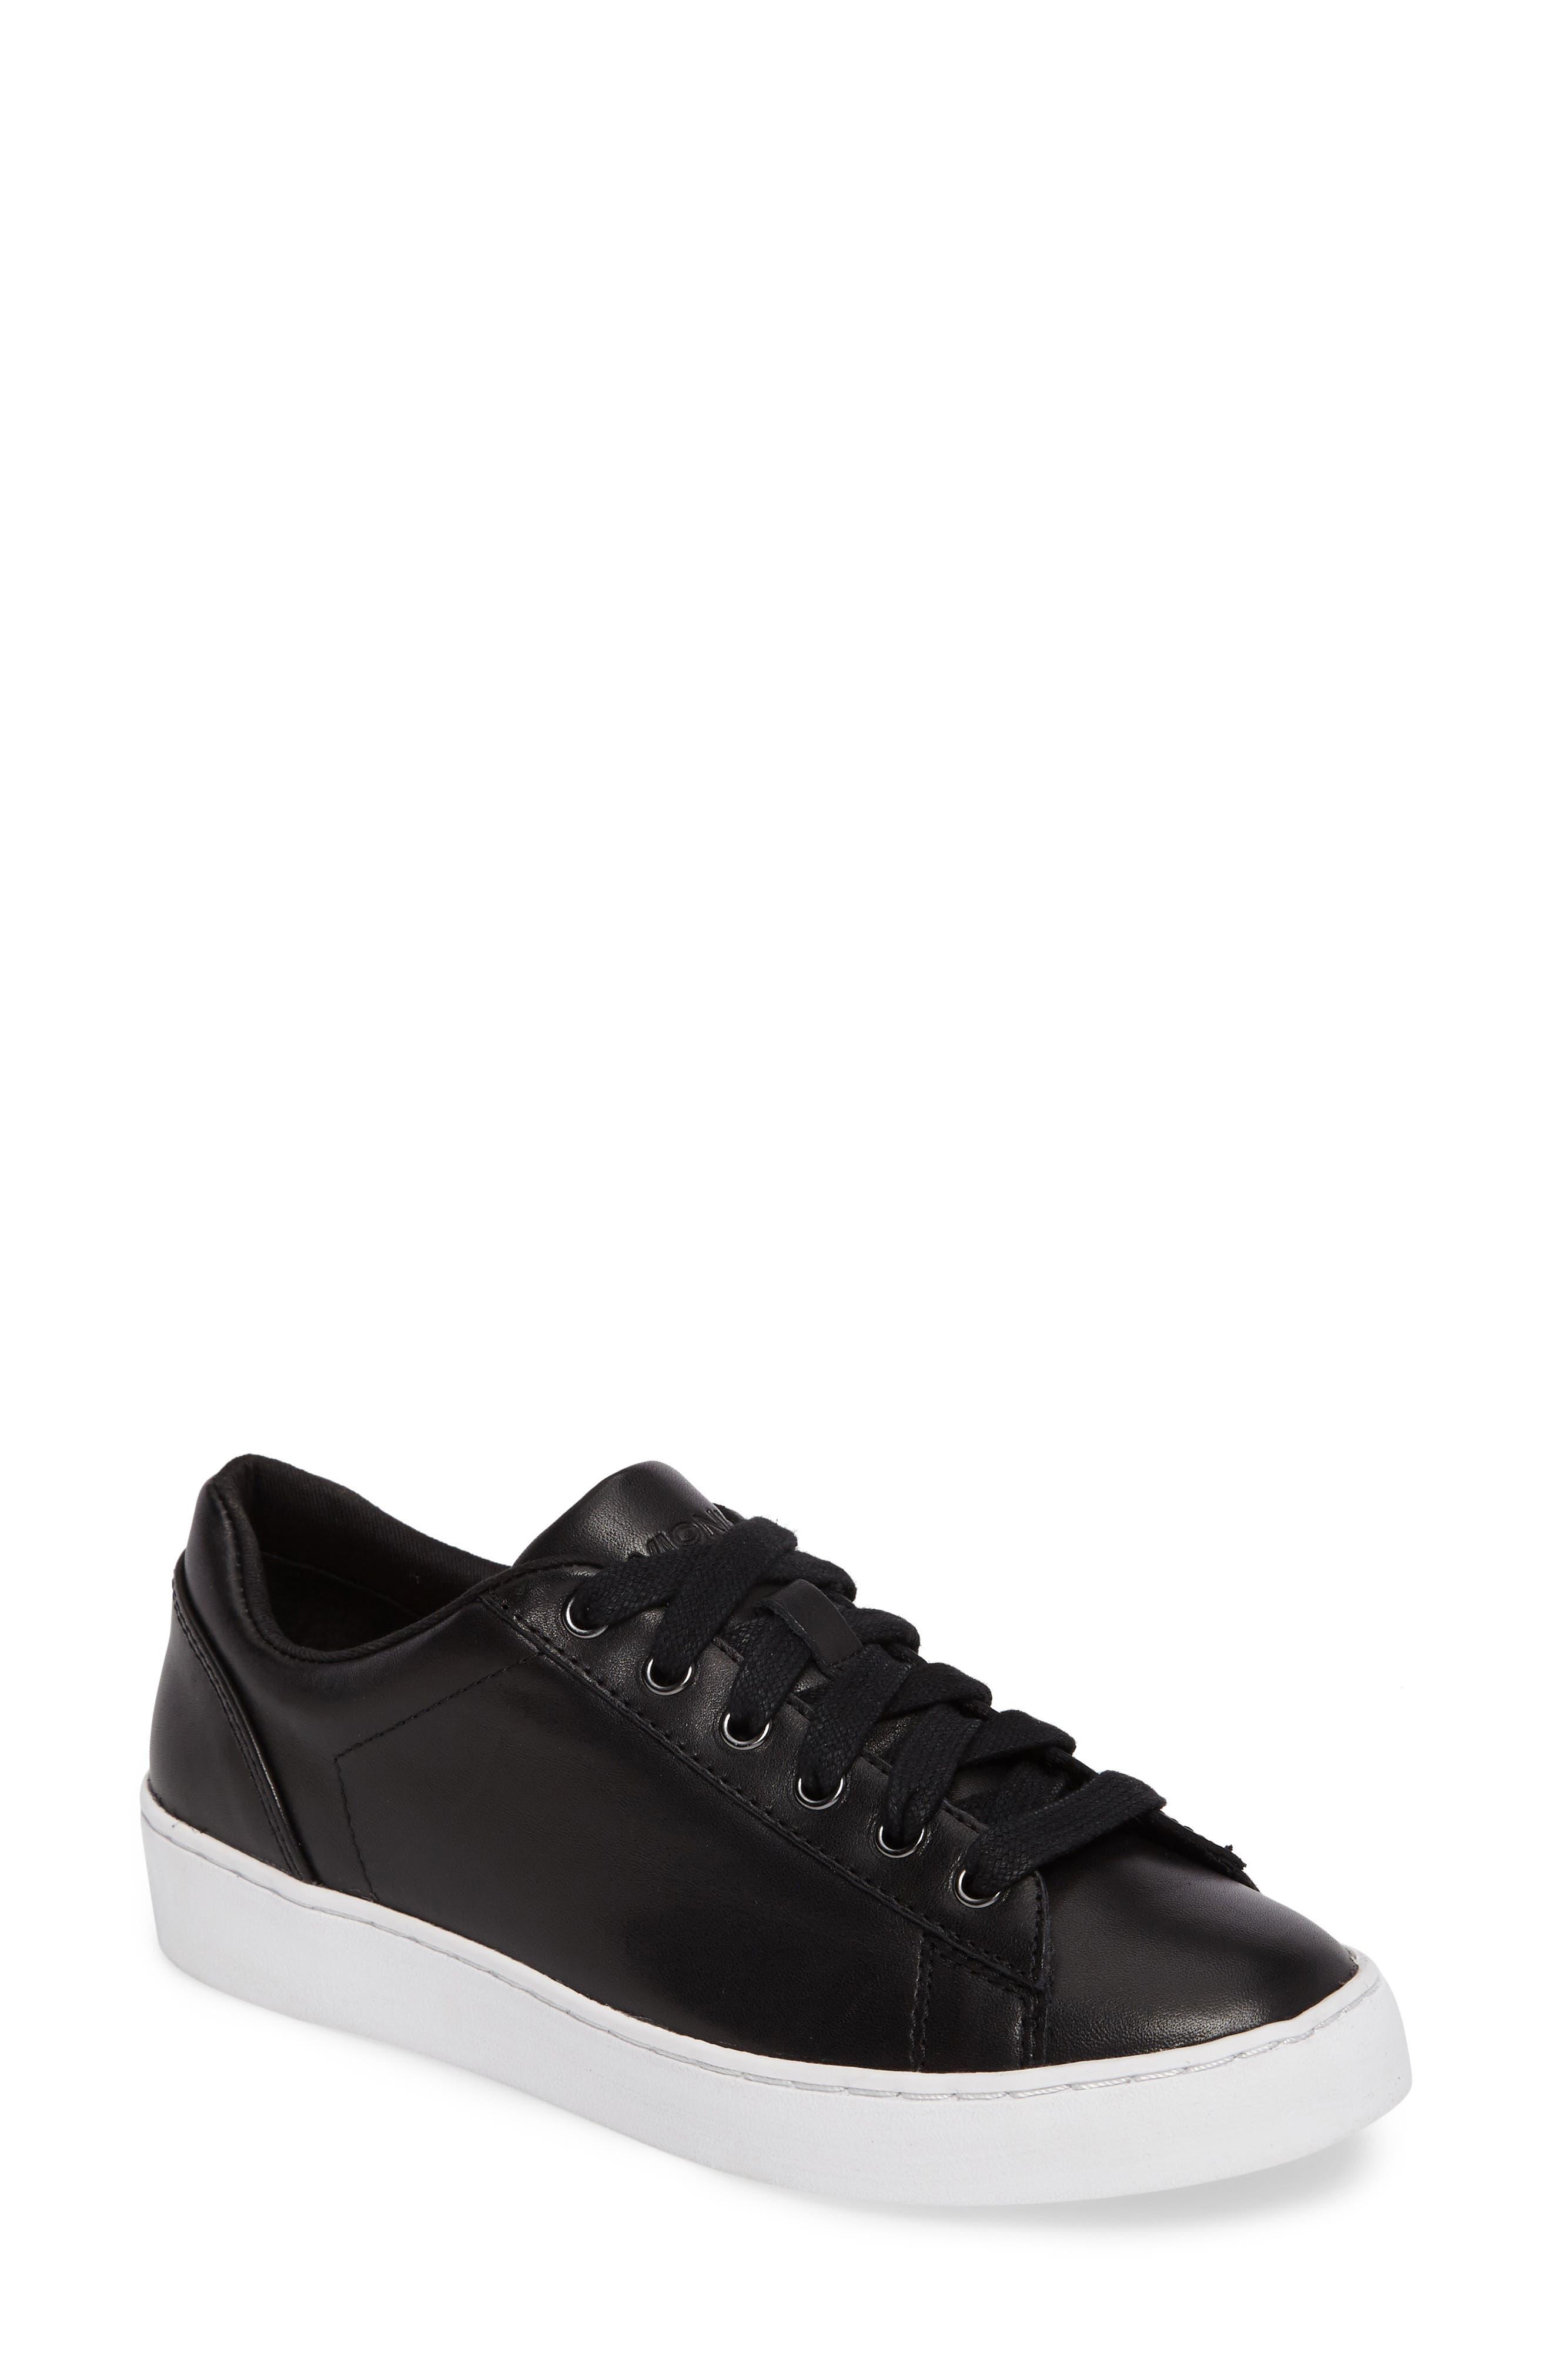 Vionic Splendid Syra Sneaker (Women). BLACK LEATHER; WHITE LEATHER